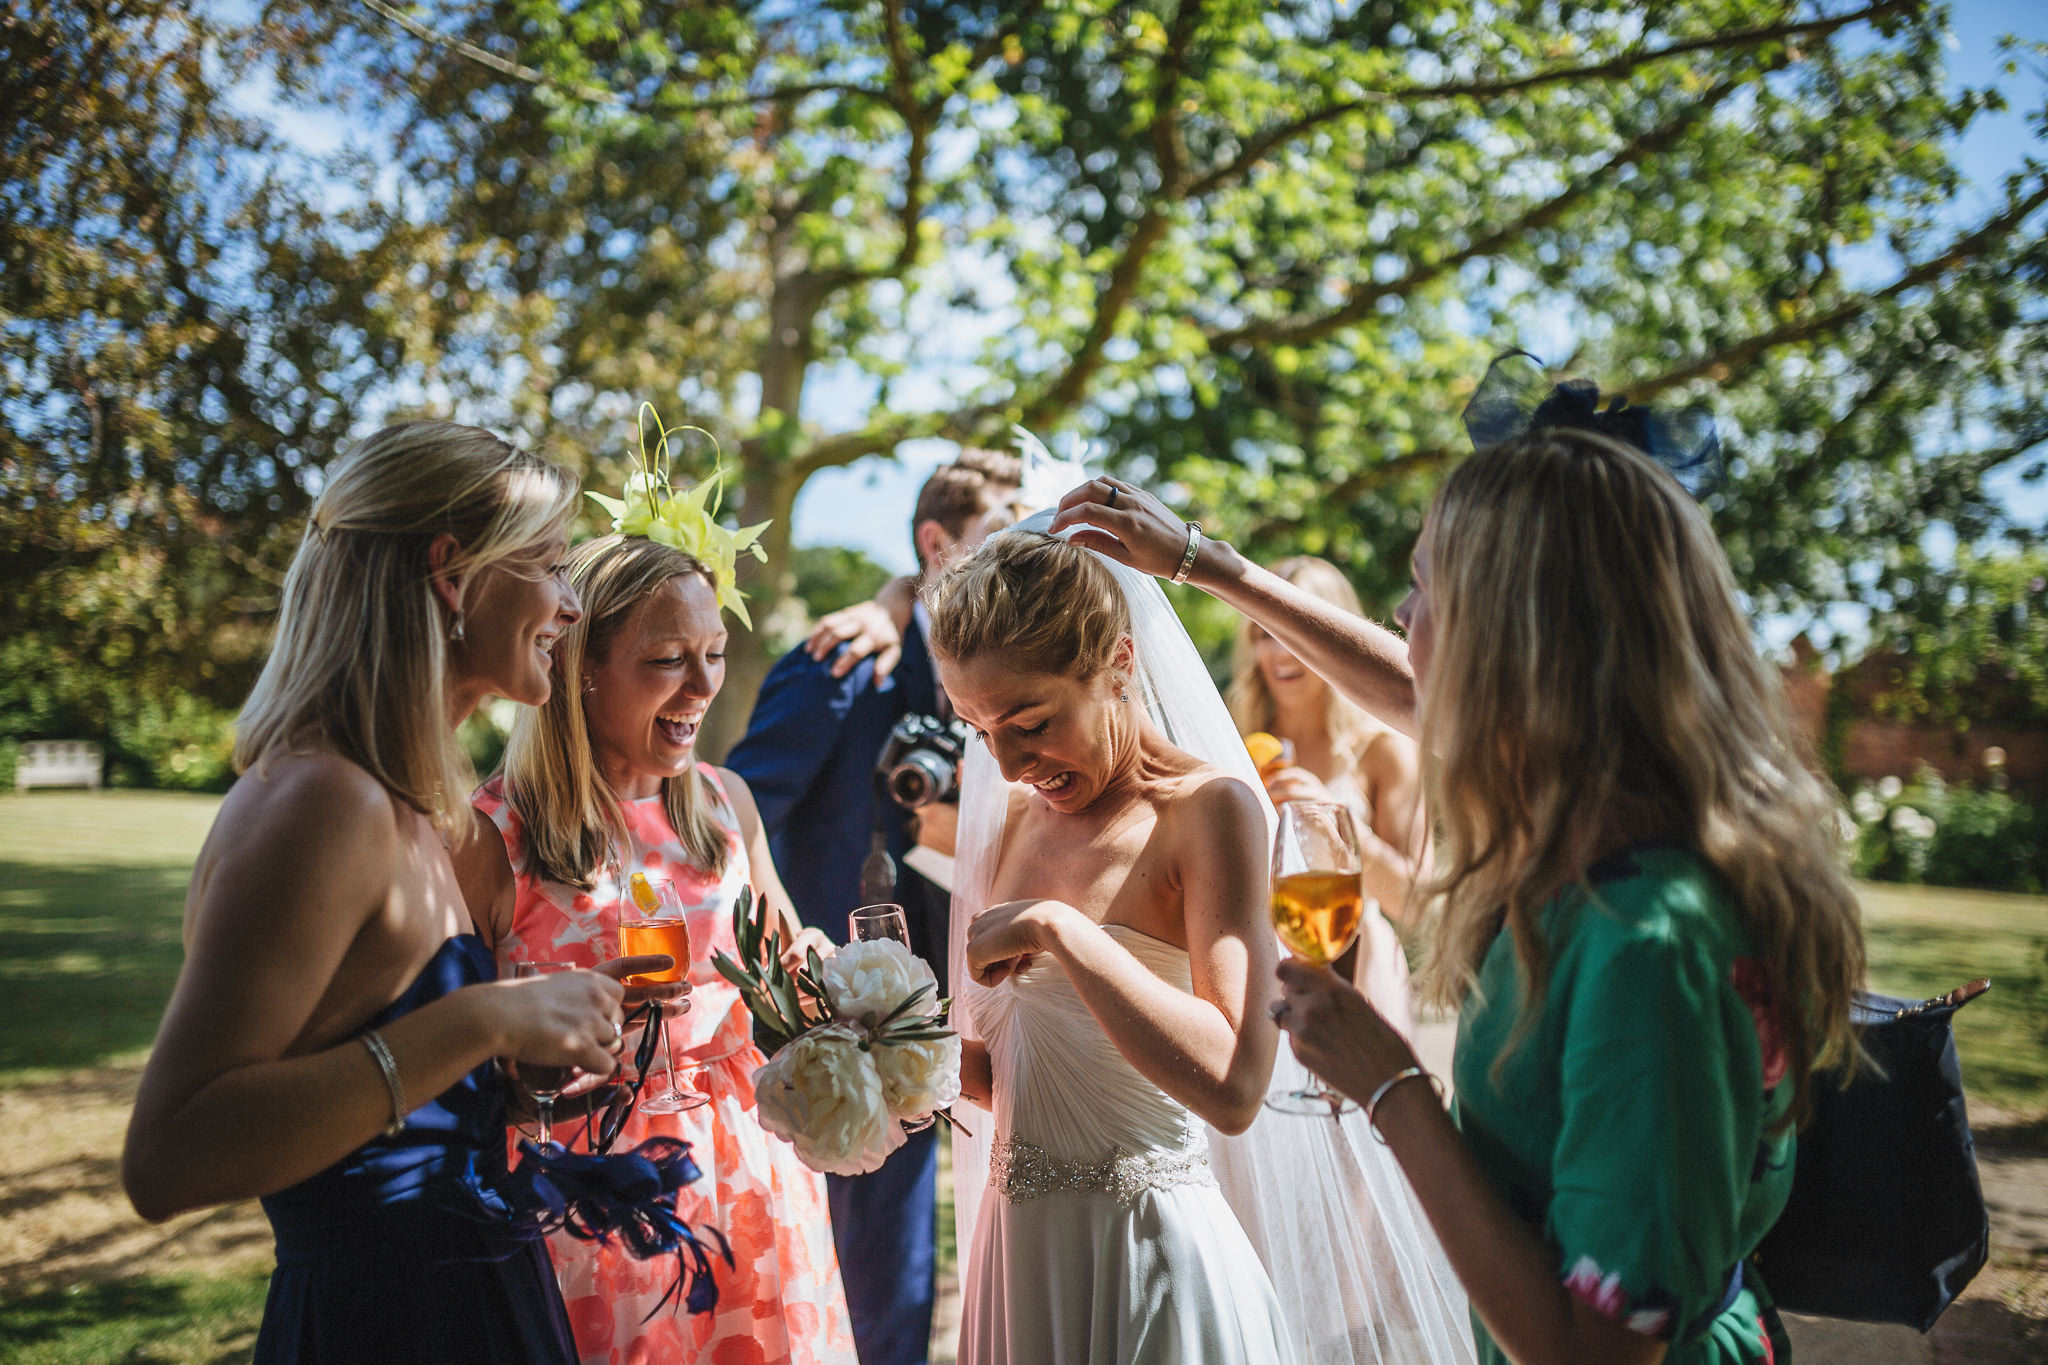 paul-marbrook-Gaynes-Park Wedding-Photographer-90066